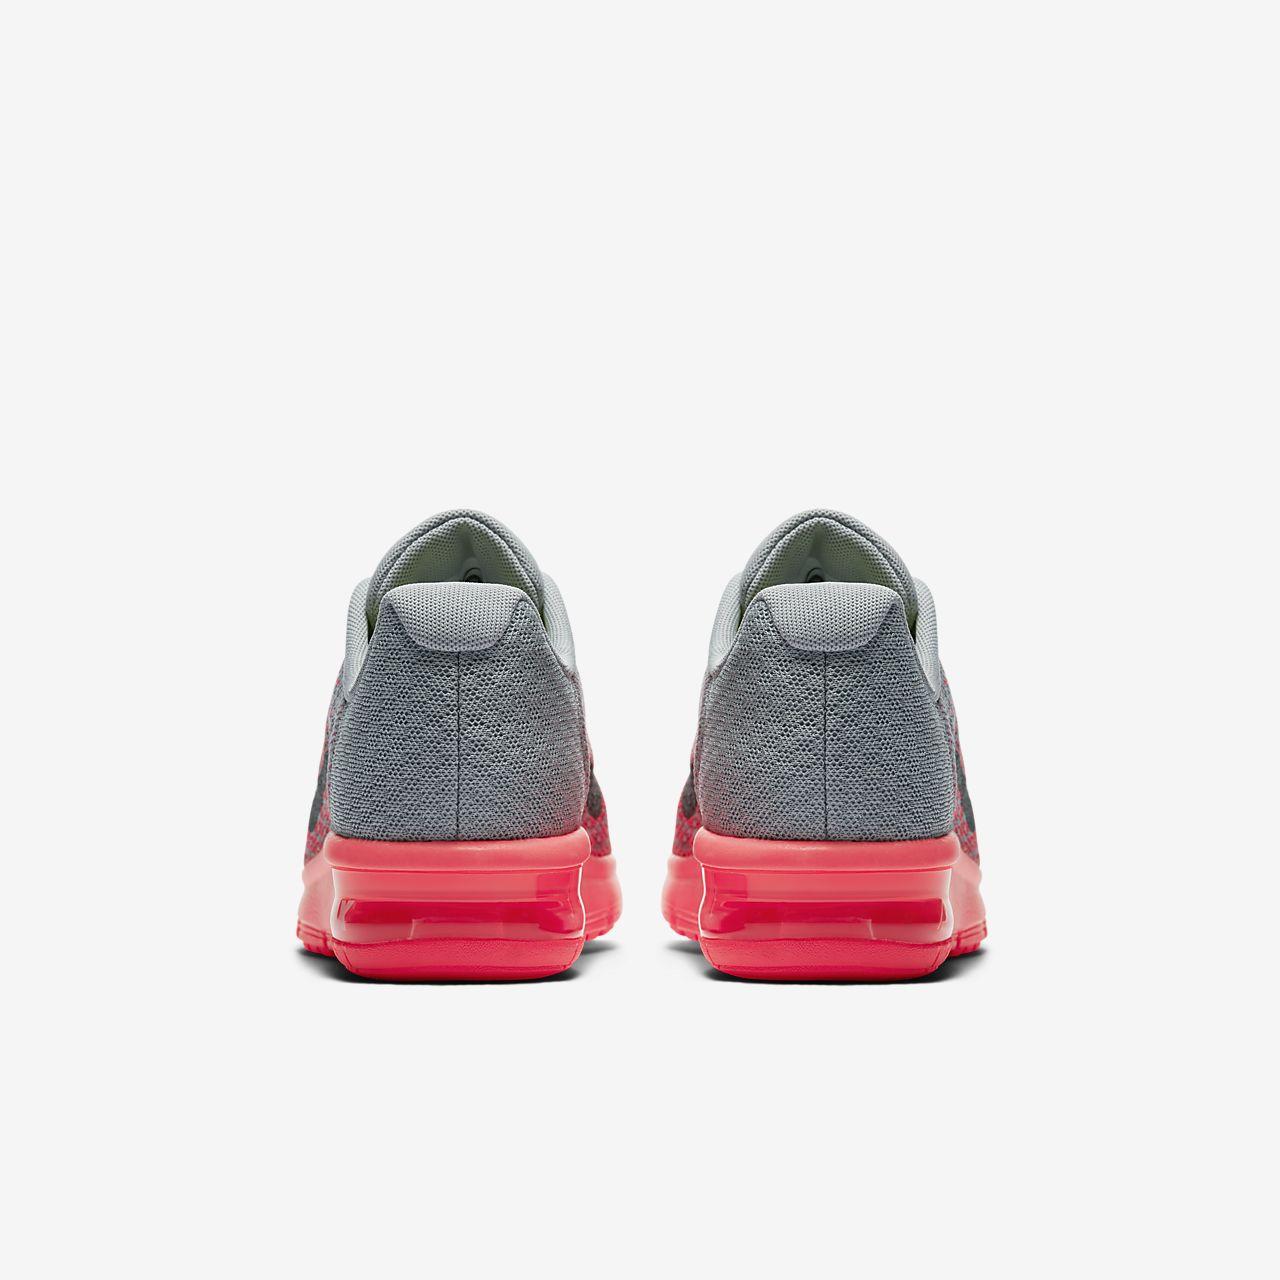 Nike Wmns Air Max Sequent 2 zapatilla de dama